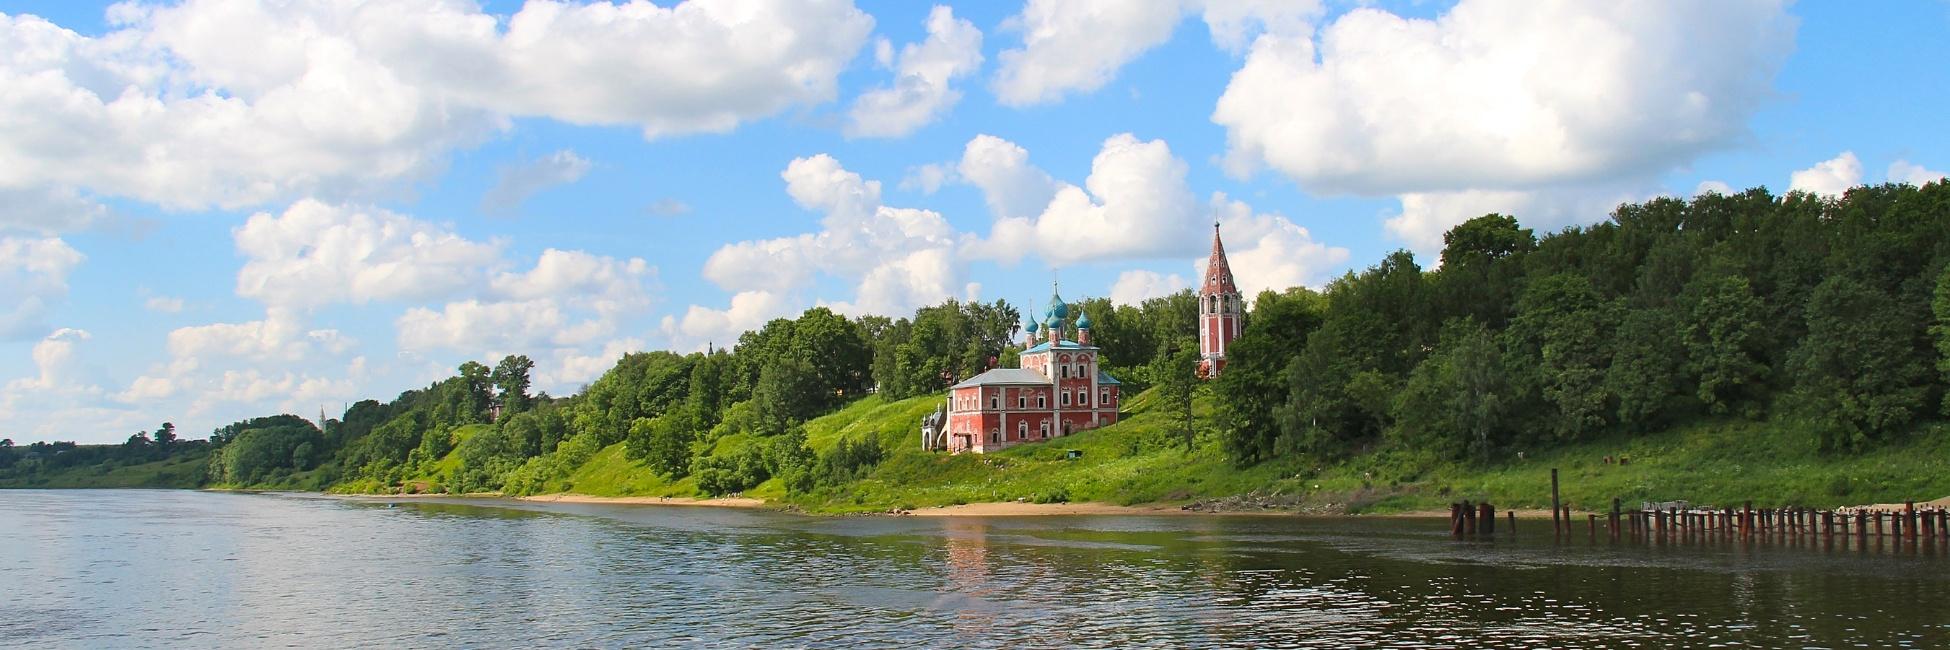 Eglise du prophète elie à Yaroslavl en Russie